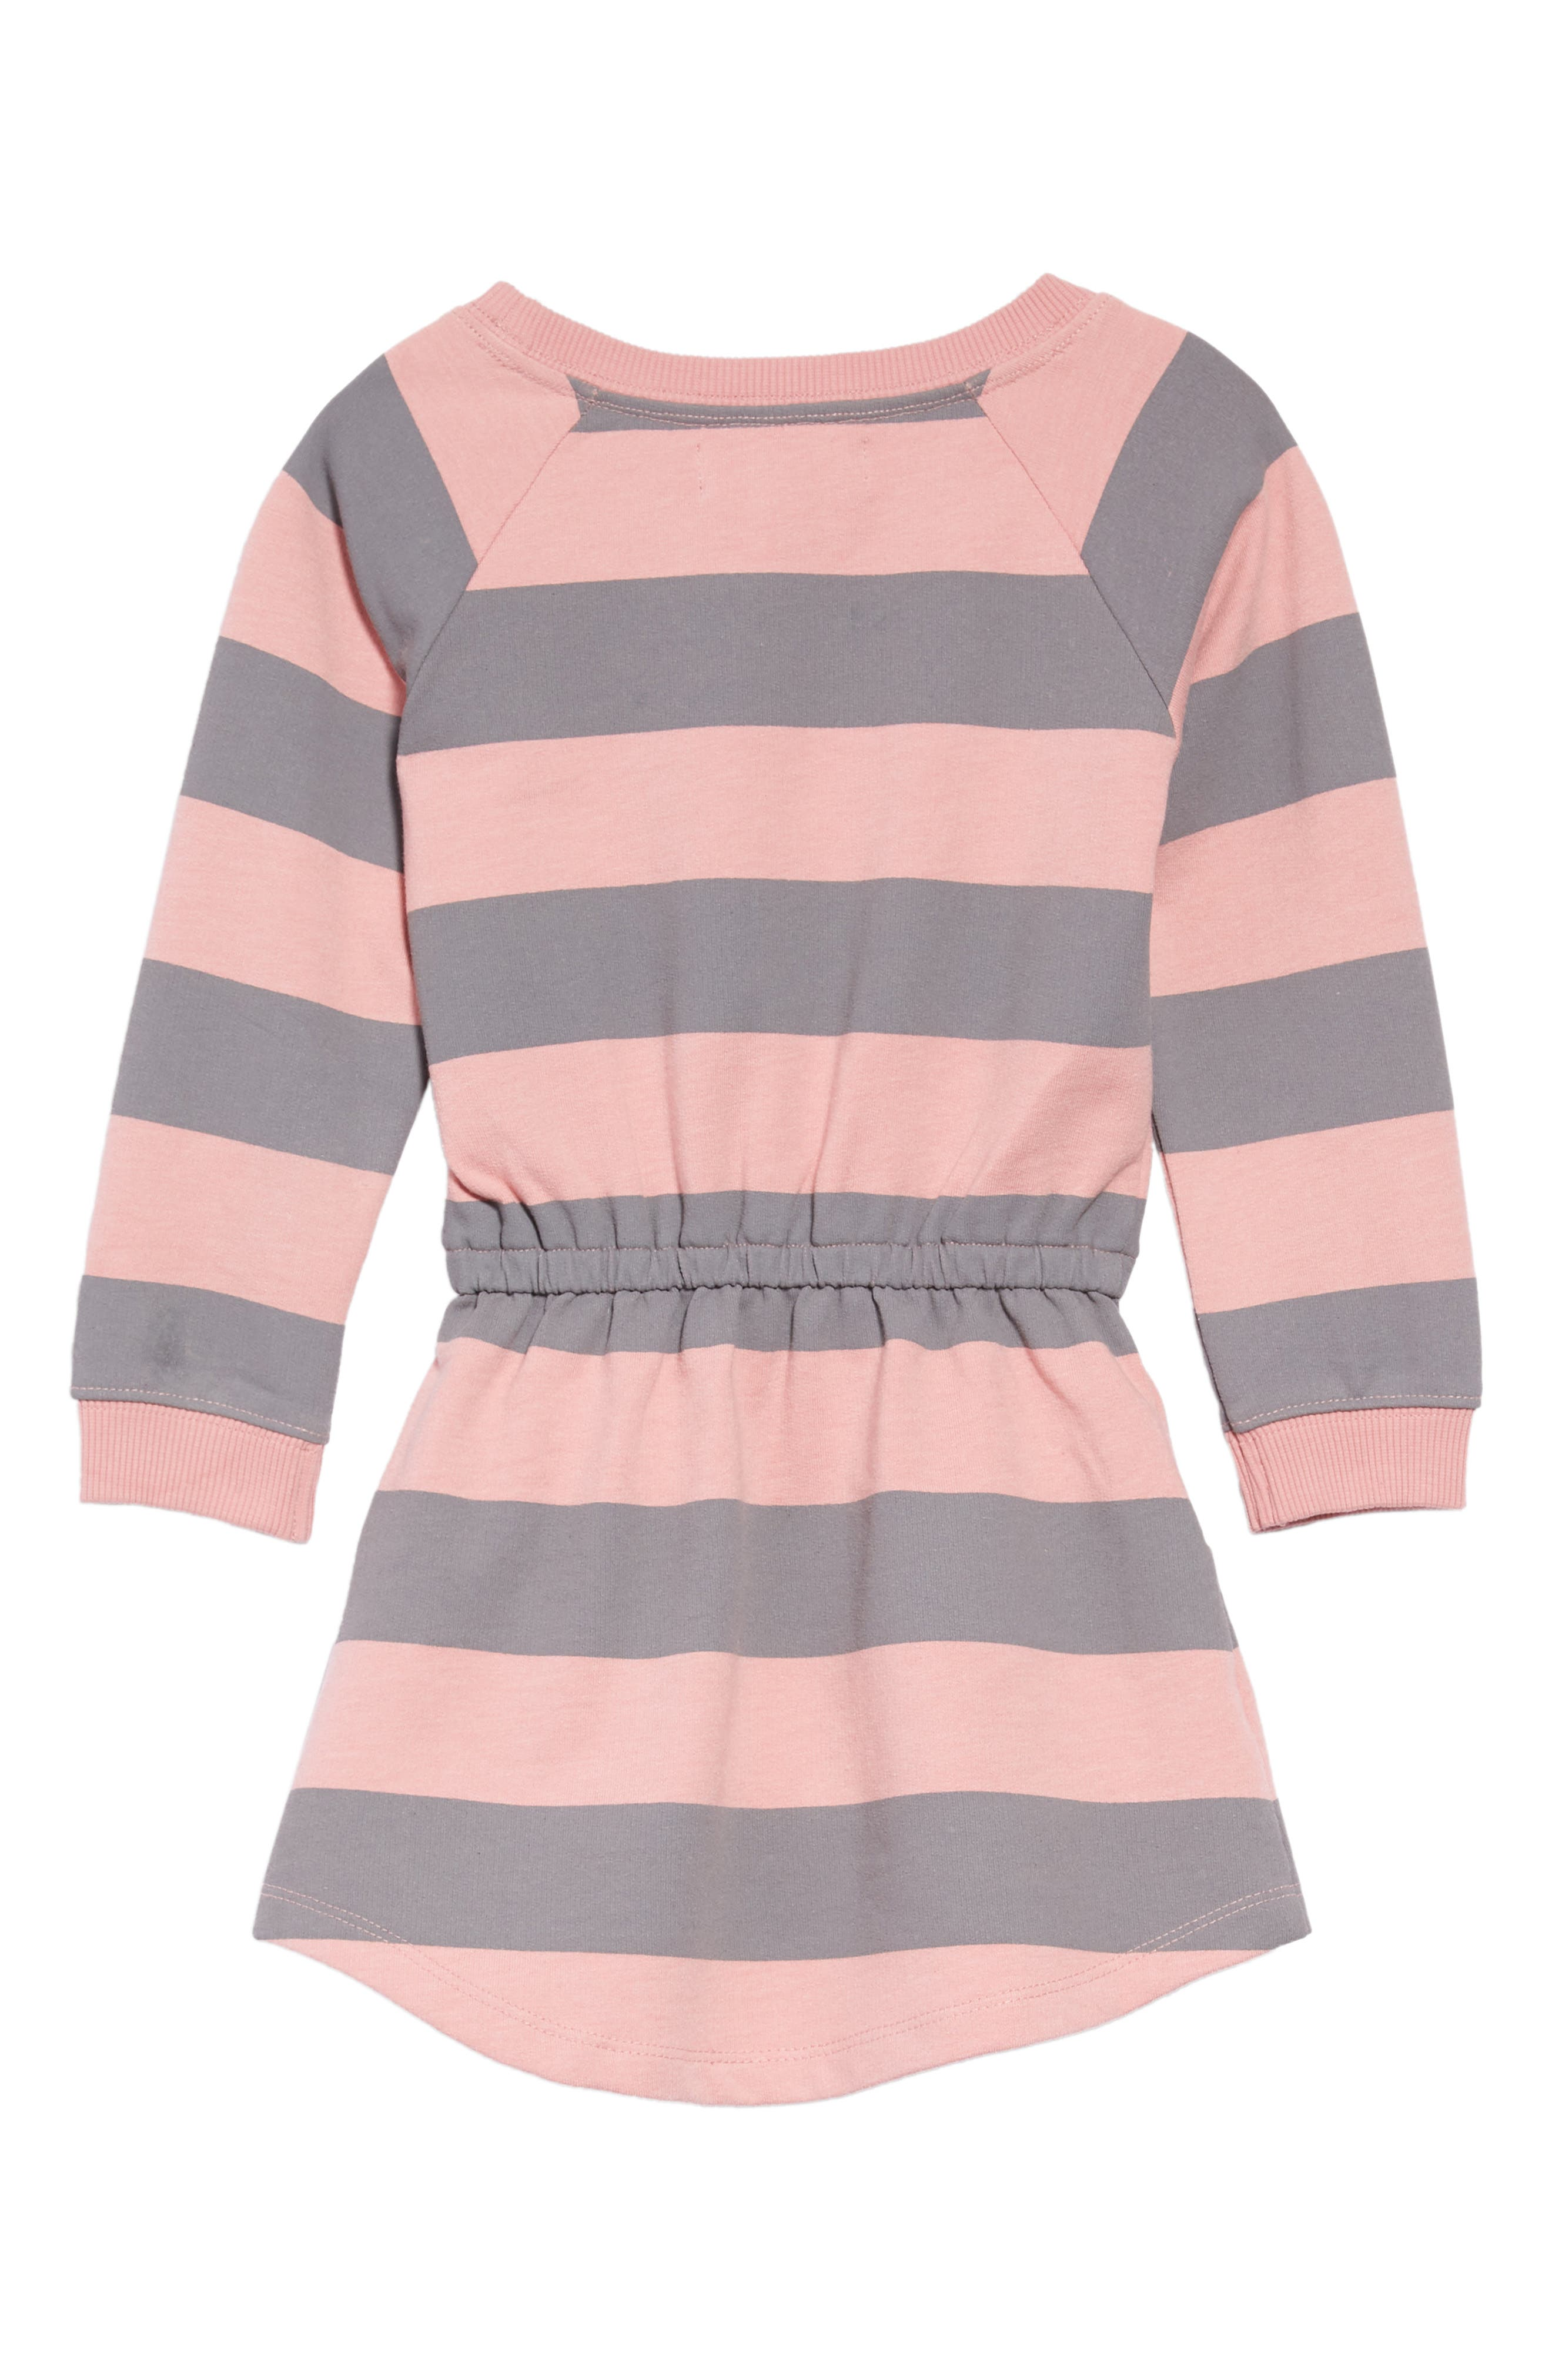 Peek Ruby Sweatshirt Dress,                             Alternate thumbnail 2, color,                             650